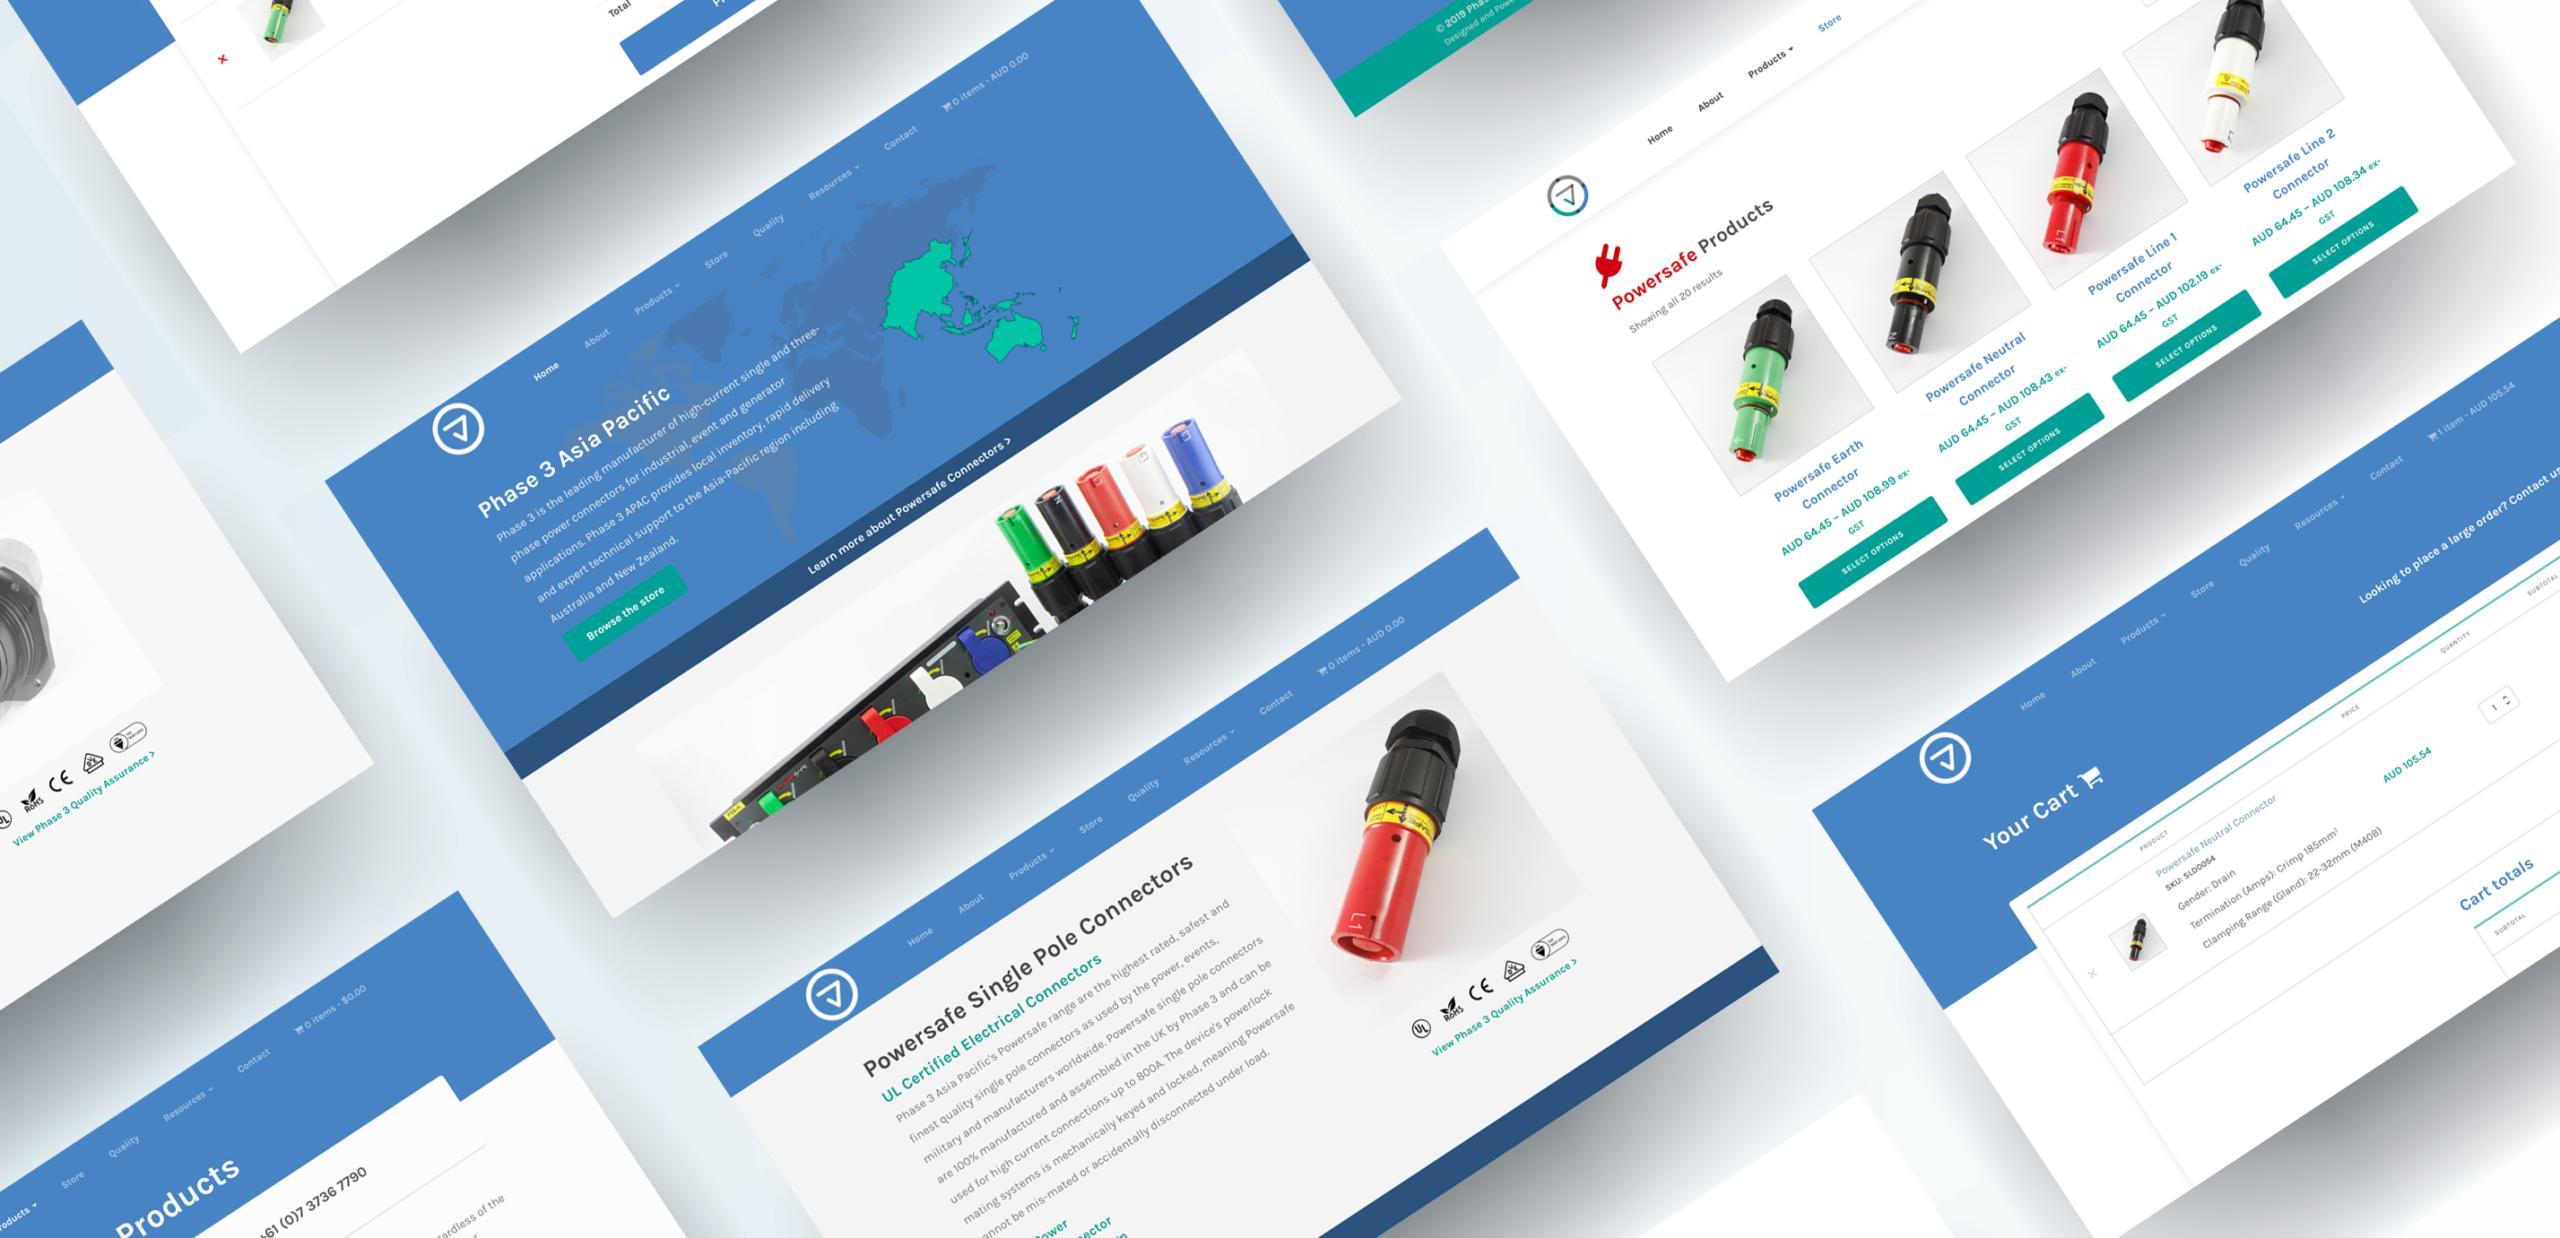 Phase 3 APAC Website